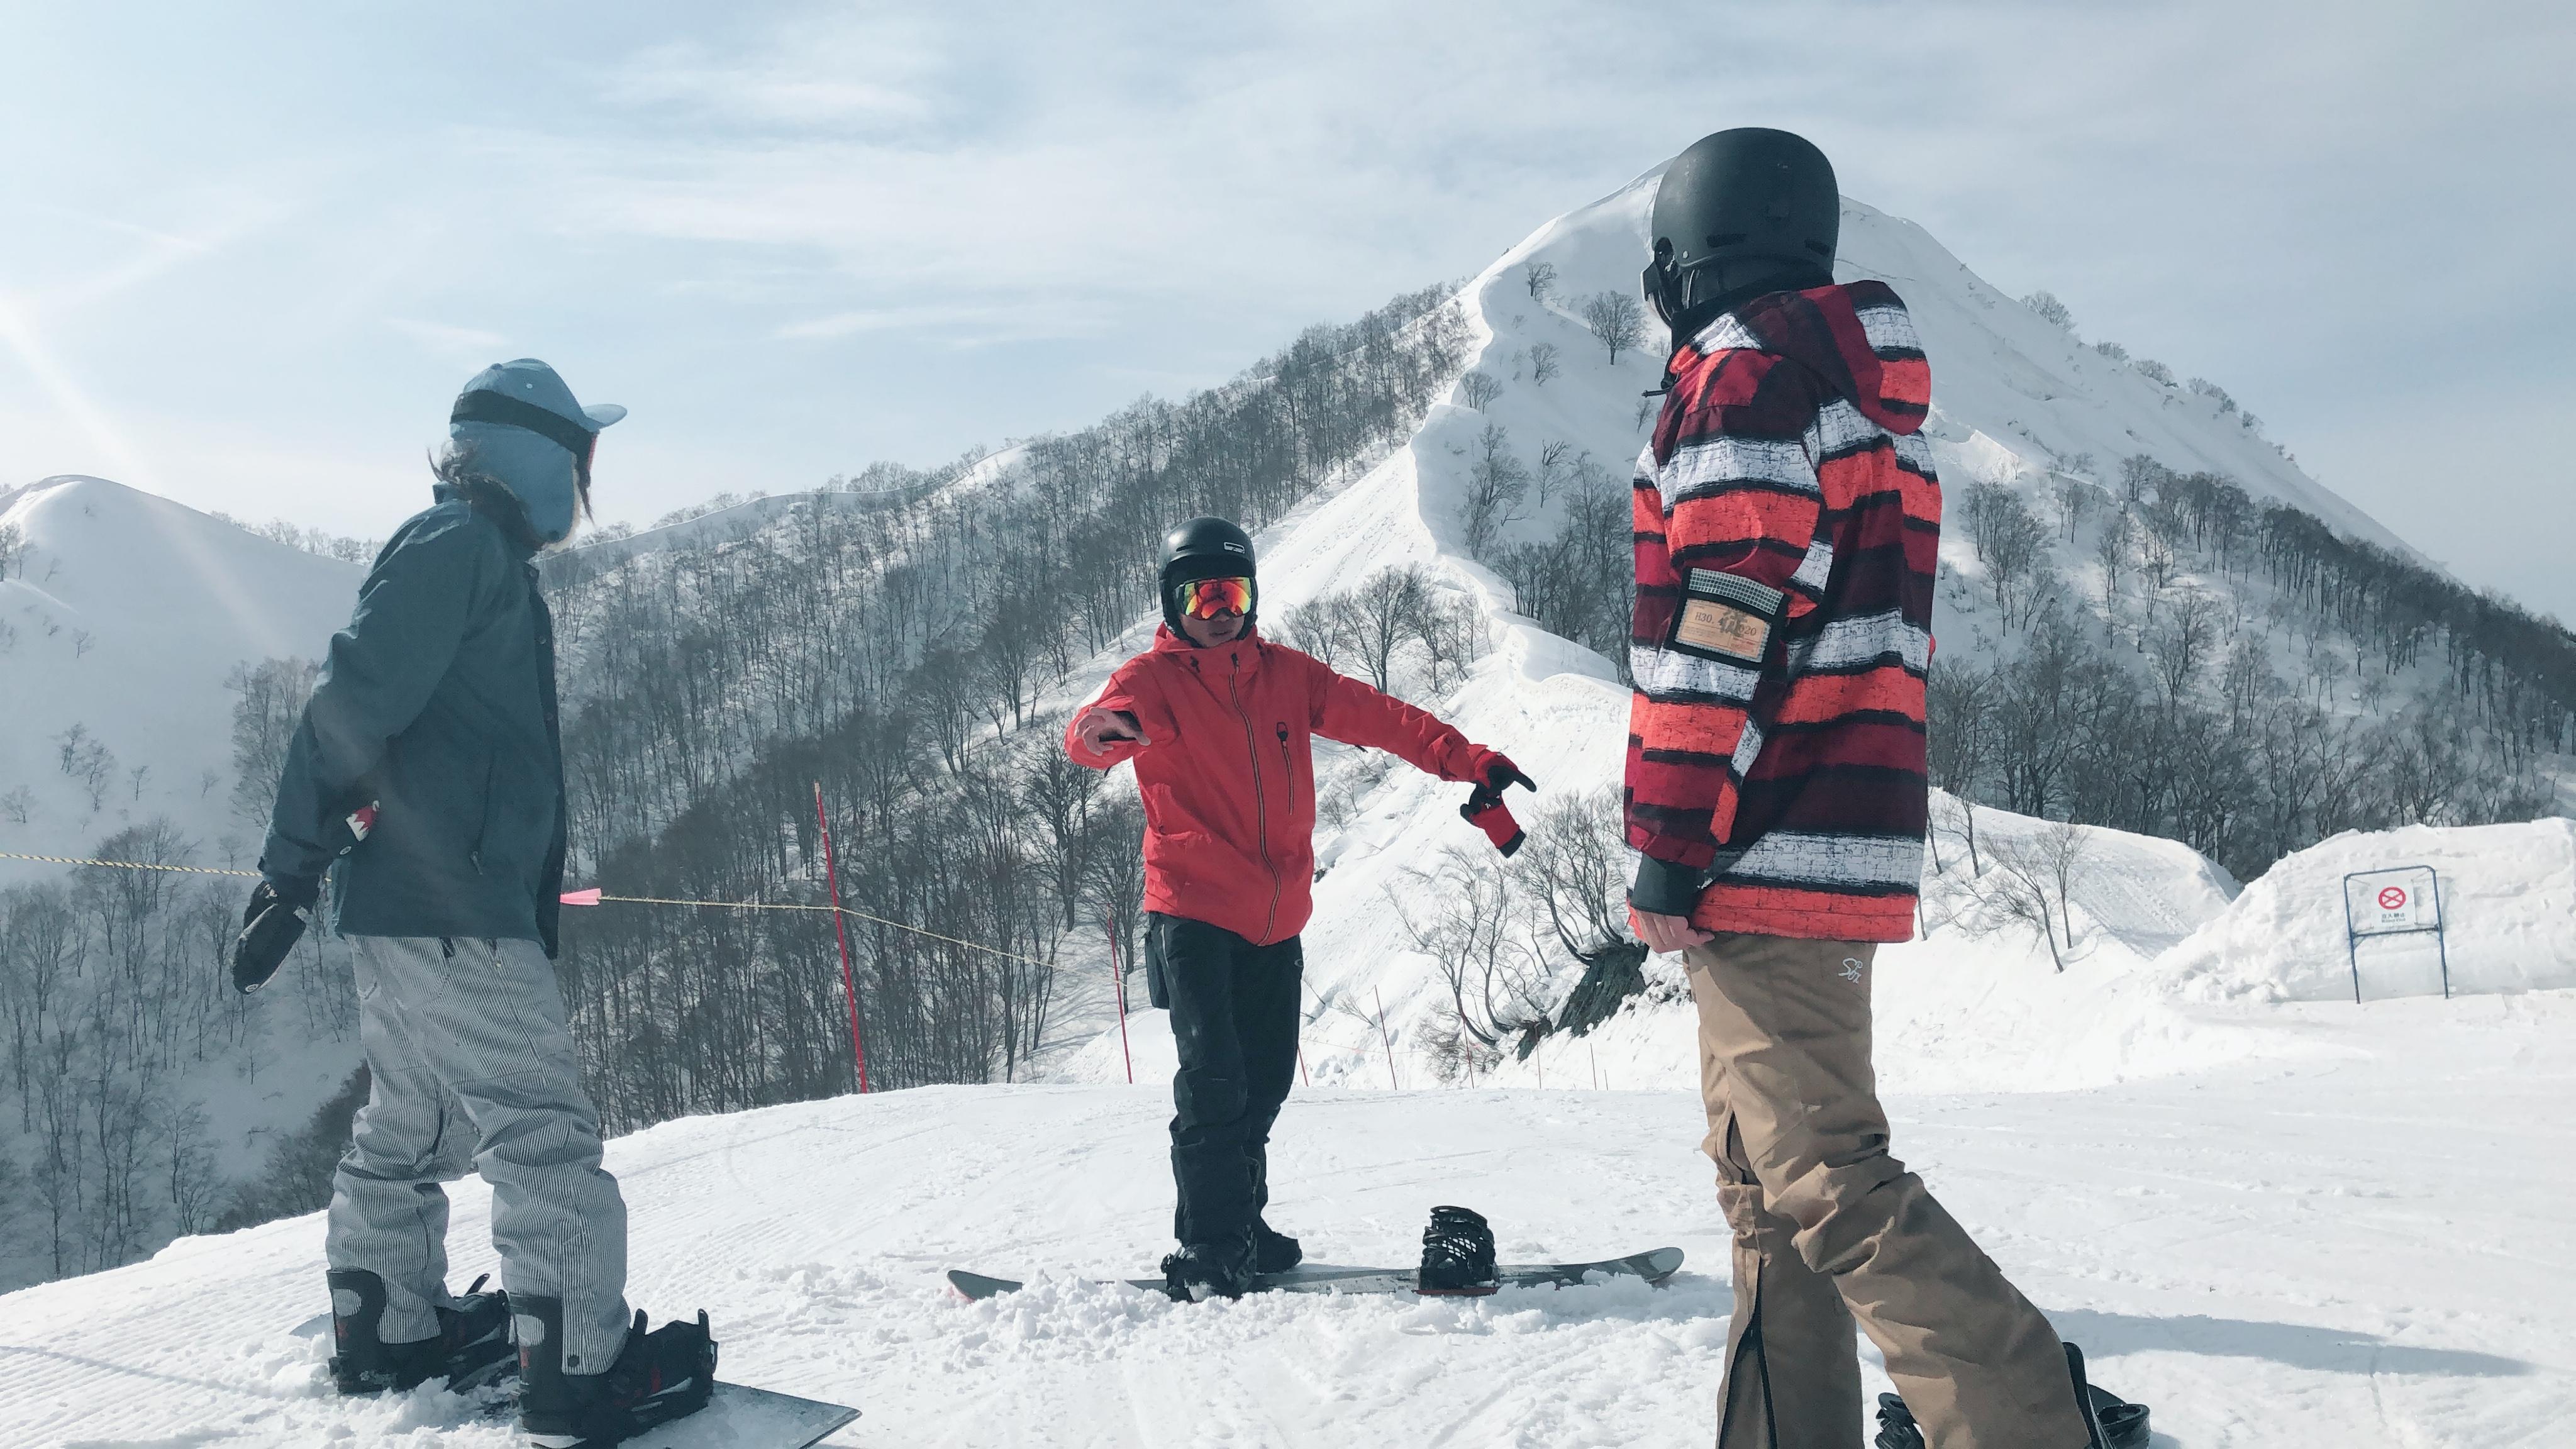 kuri-chan snowboarding